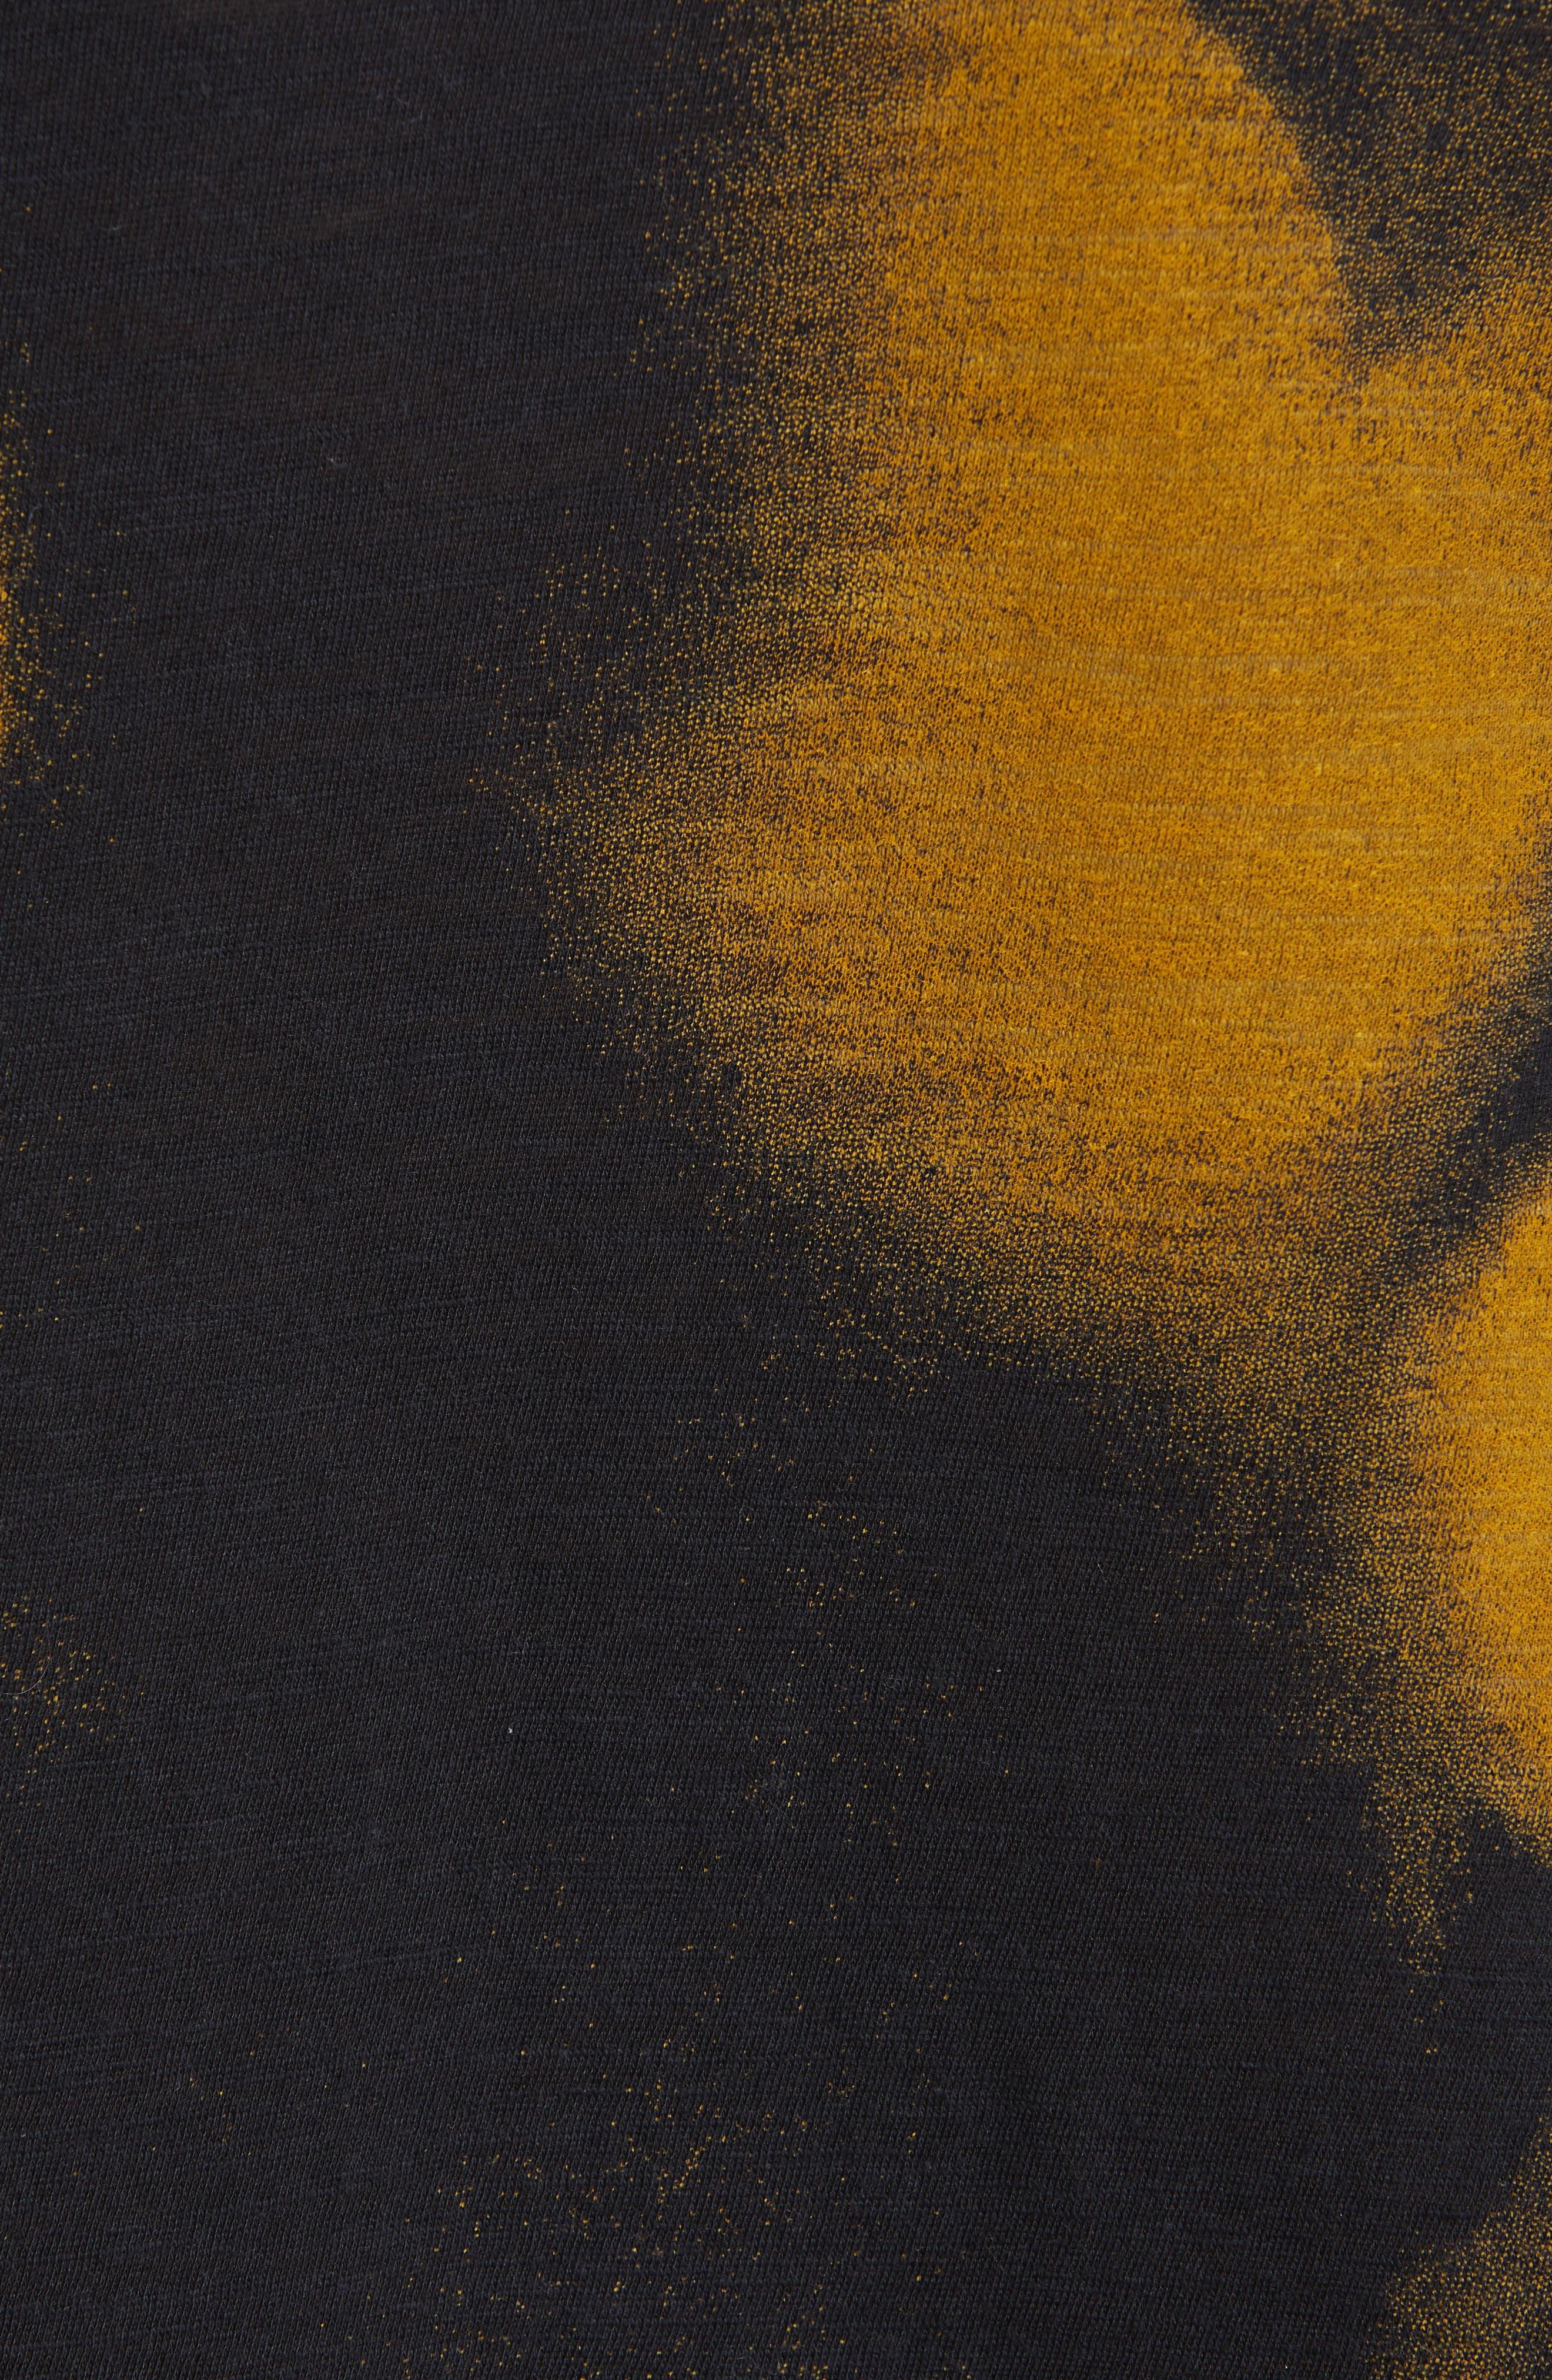 PROENZA SCHOULER, Print Jersey Tee, Alternate thumbnail 5, color, YELLOW/ BLACK ROSE PRINT